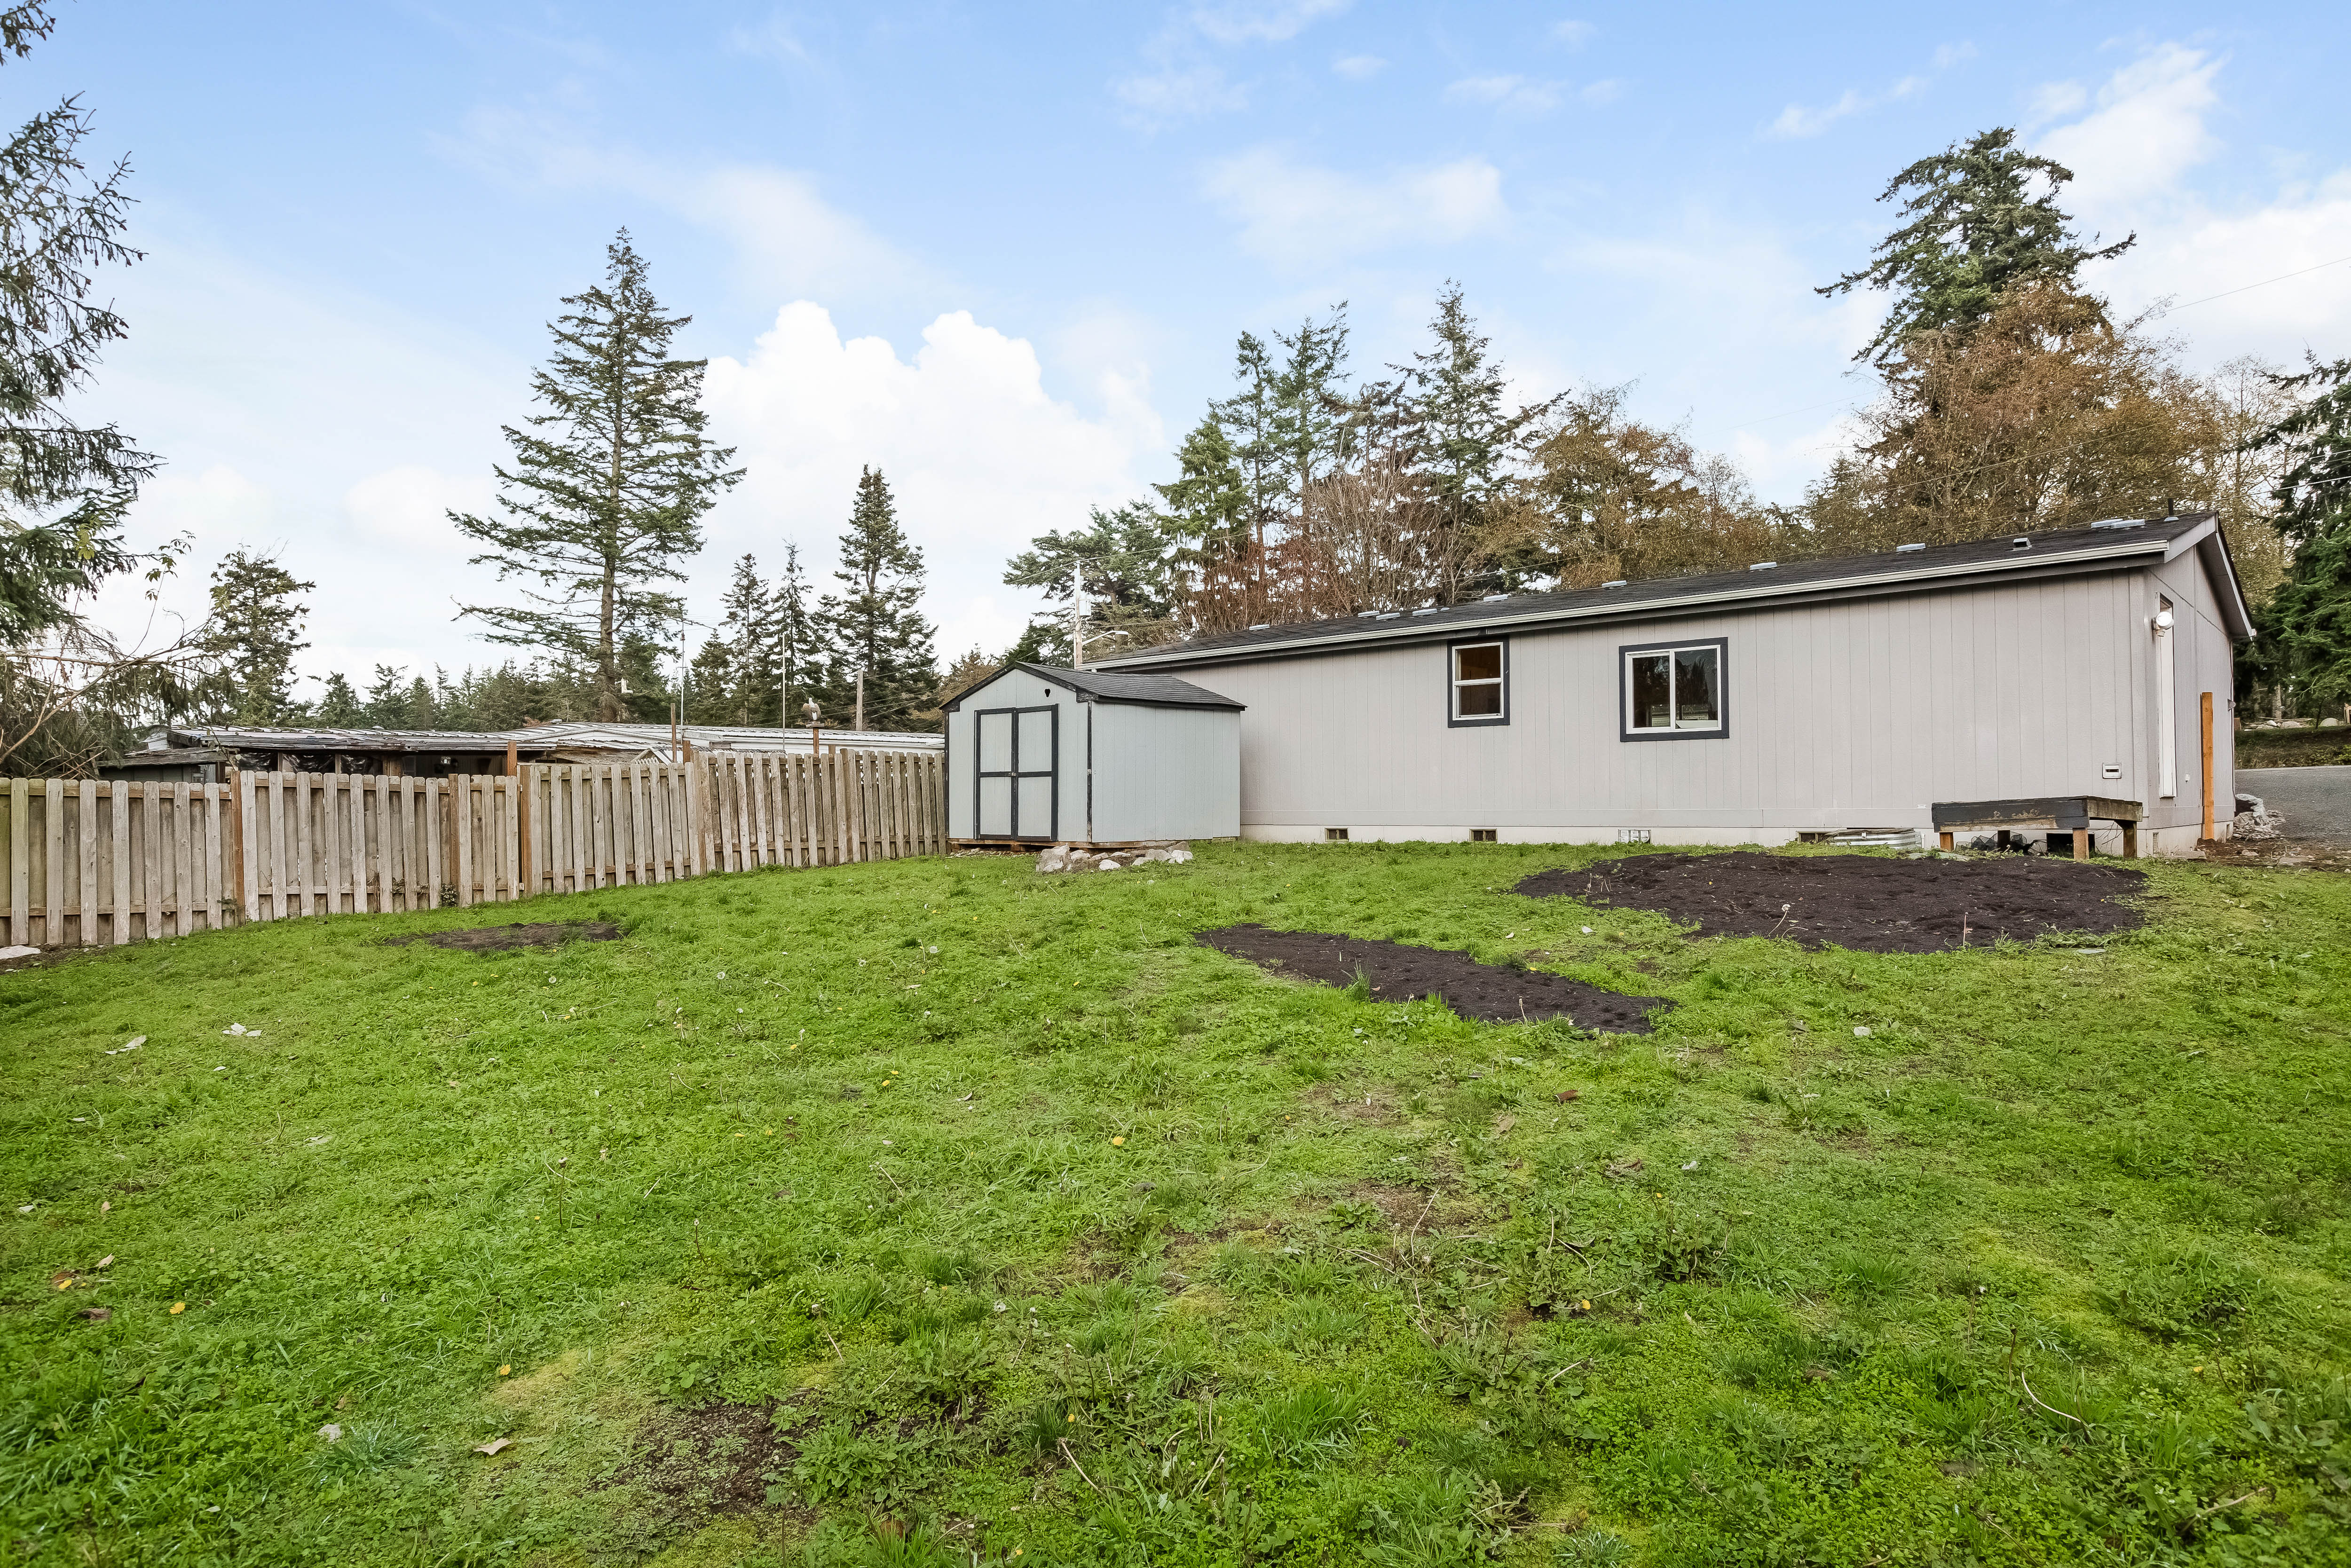 Back yards, Whidbey Island, Island life, Anita Johnston, Windermere